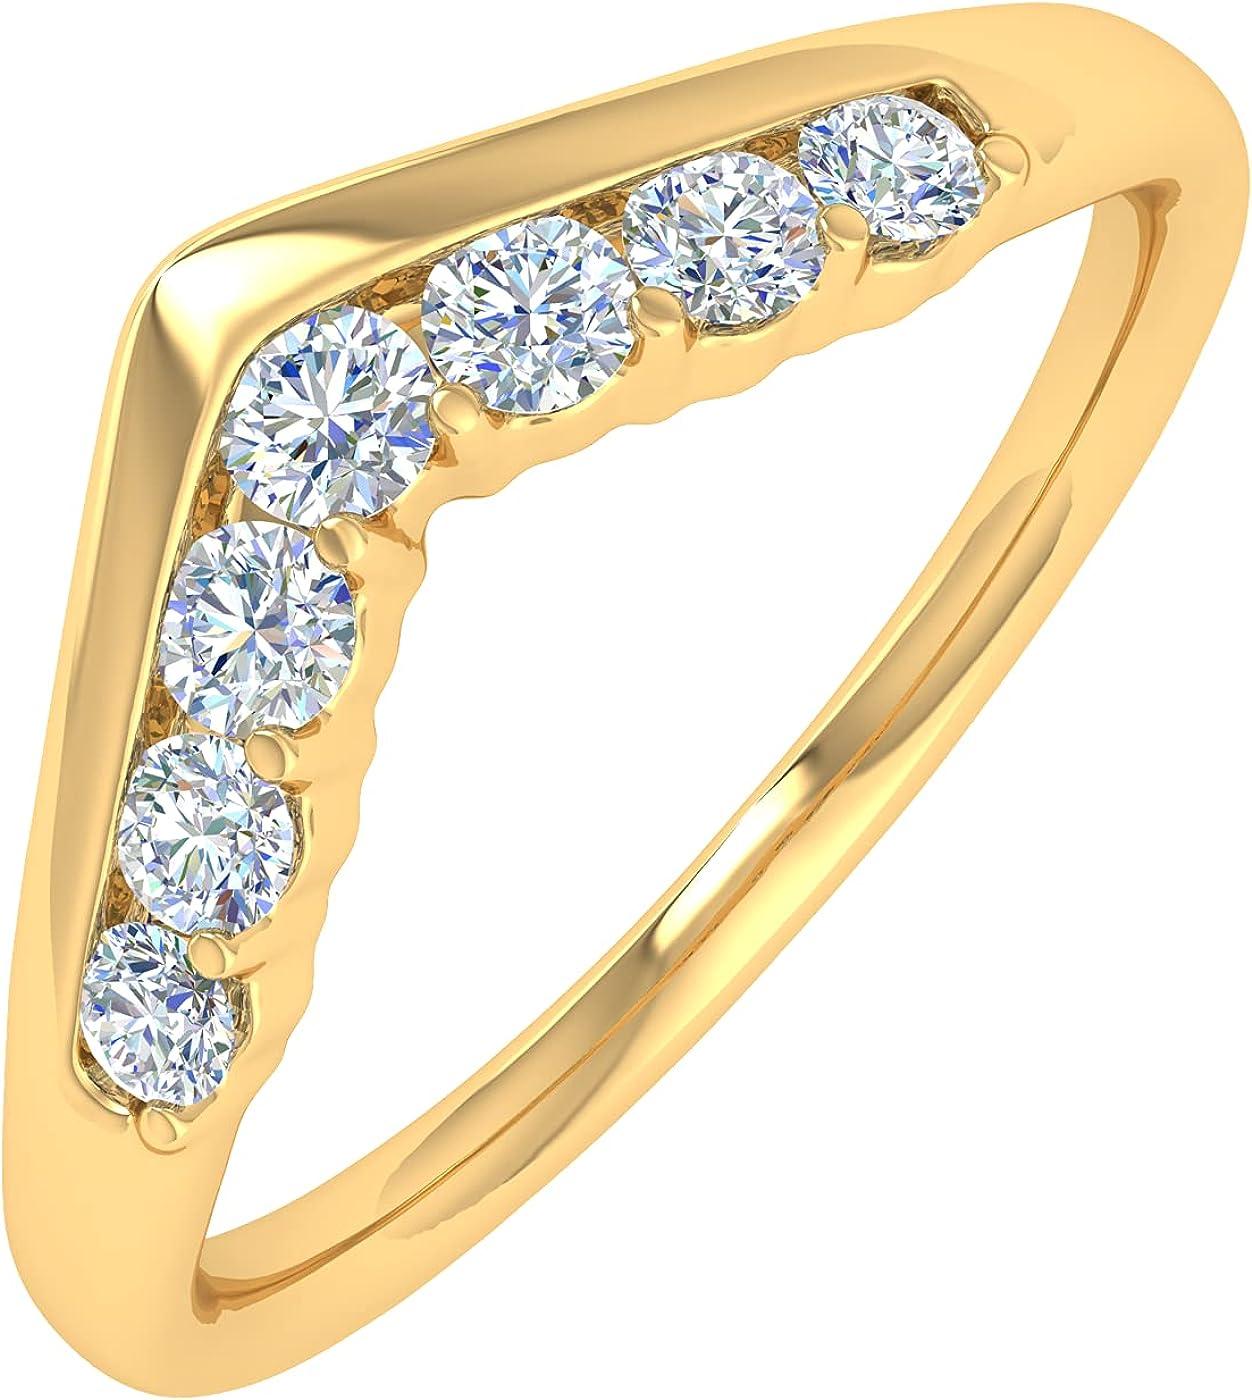 1/4 Carat Diamond Wedding Anniversary Ring in 14K Gold